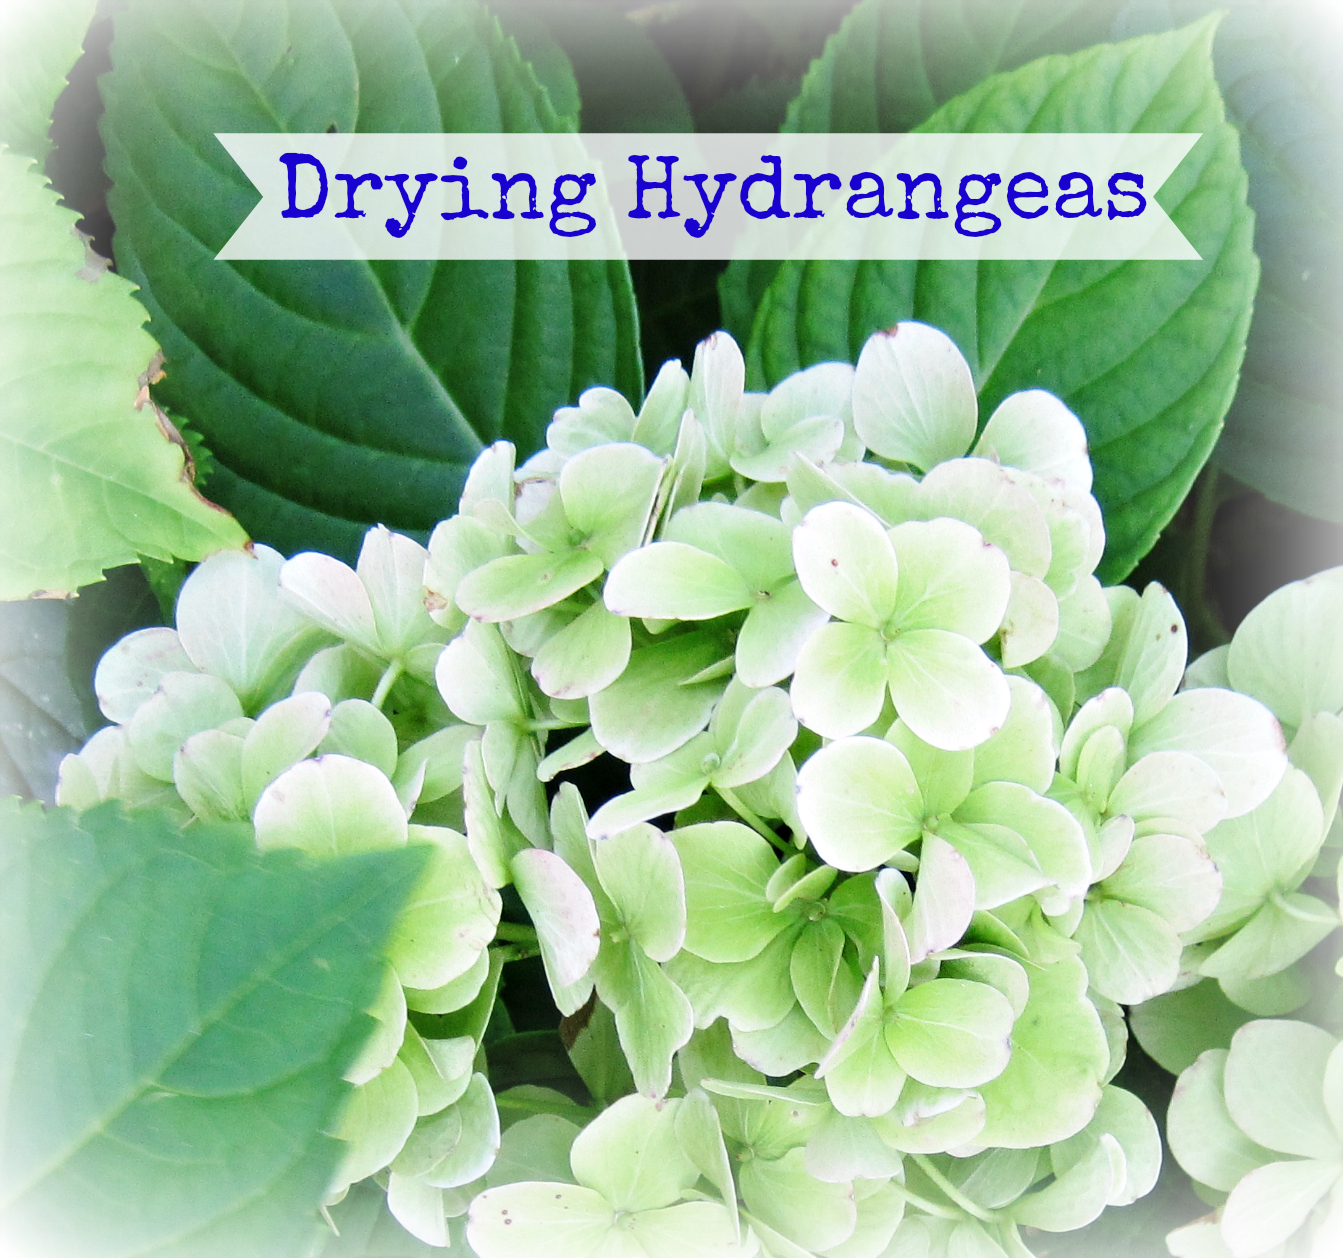 drying hydrangeas tutorial